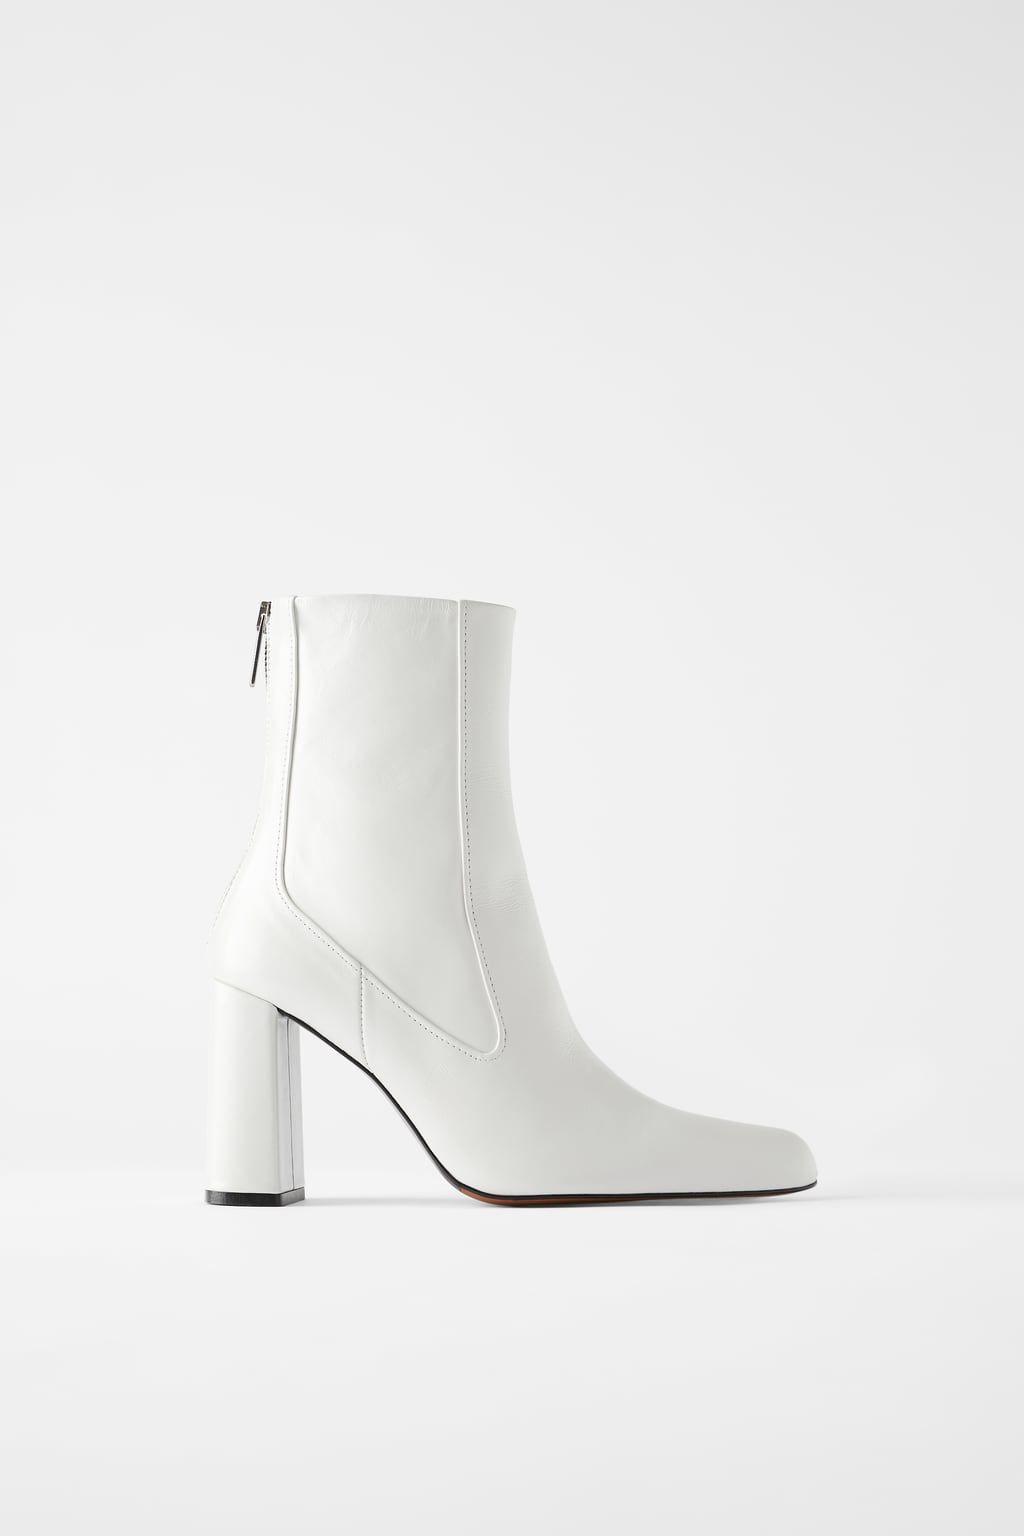 Zara boots: 9 best boots at Zara